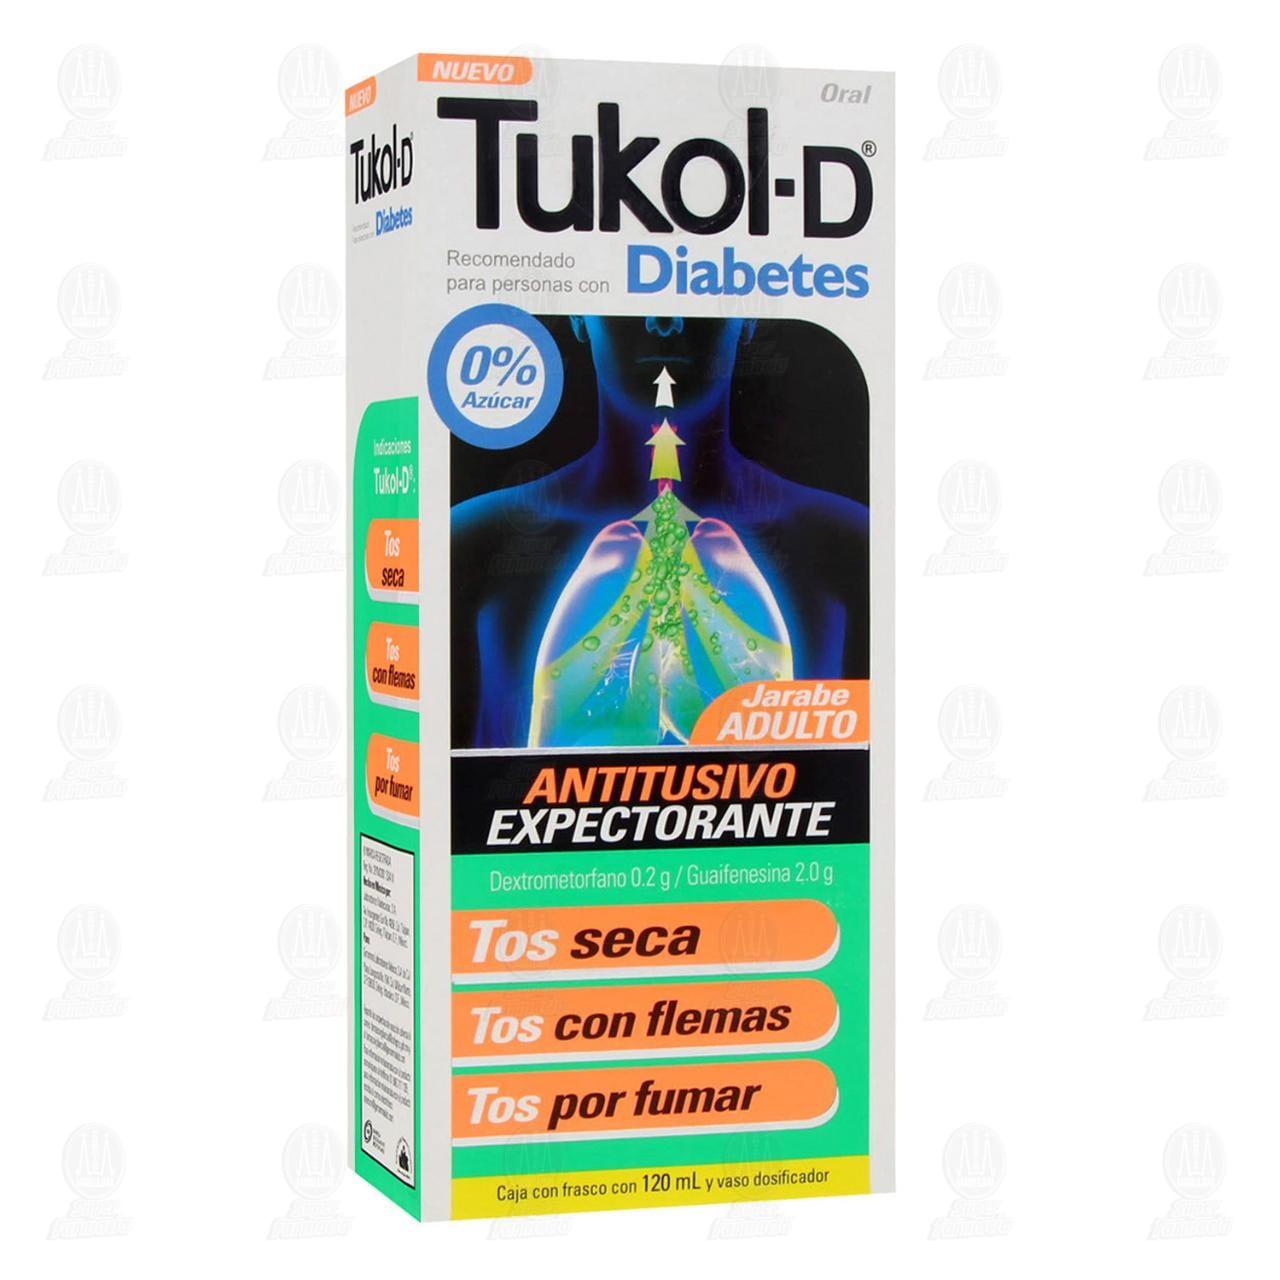 Comprar Tukol-D Jarabe Adulto Diabetes 120ml en Farmacias Guadalajara